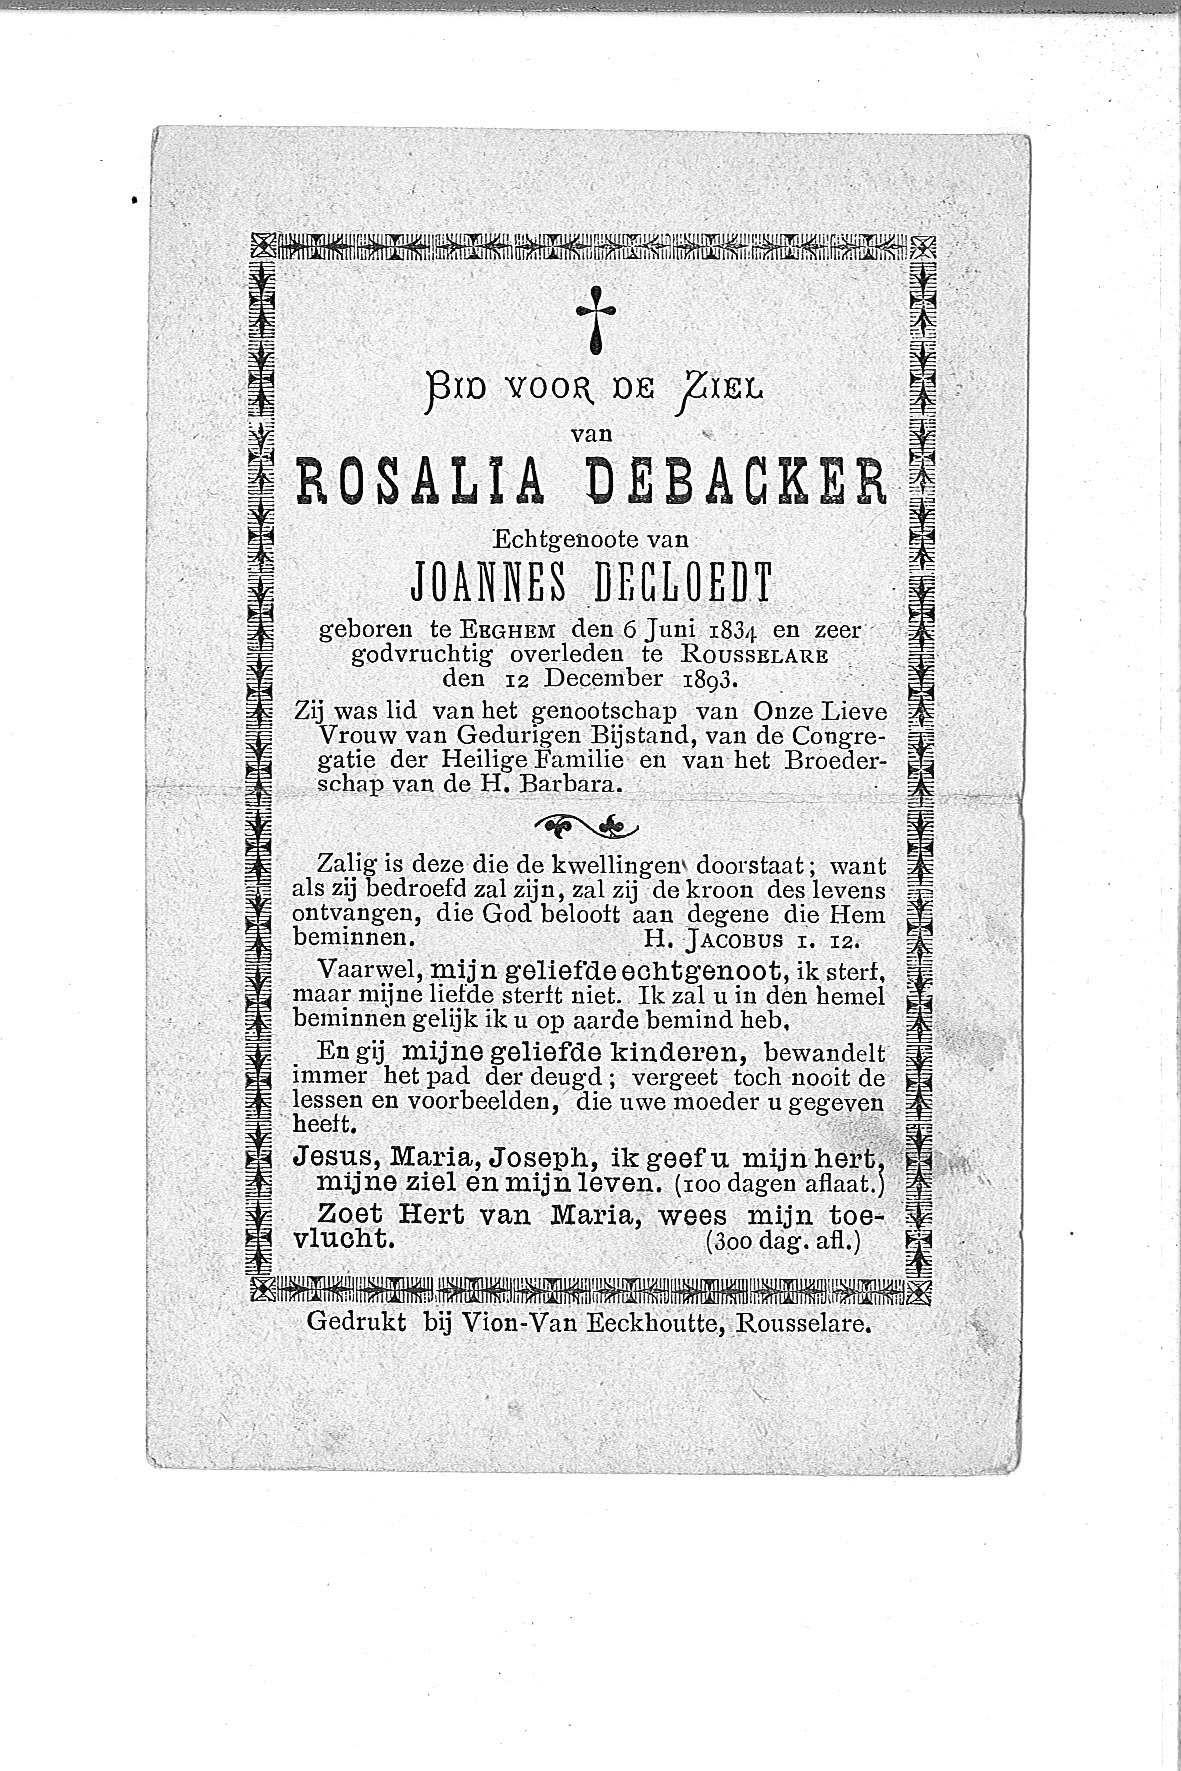 Rosalia (1893) 20120529153758_00047.jpg